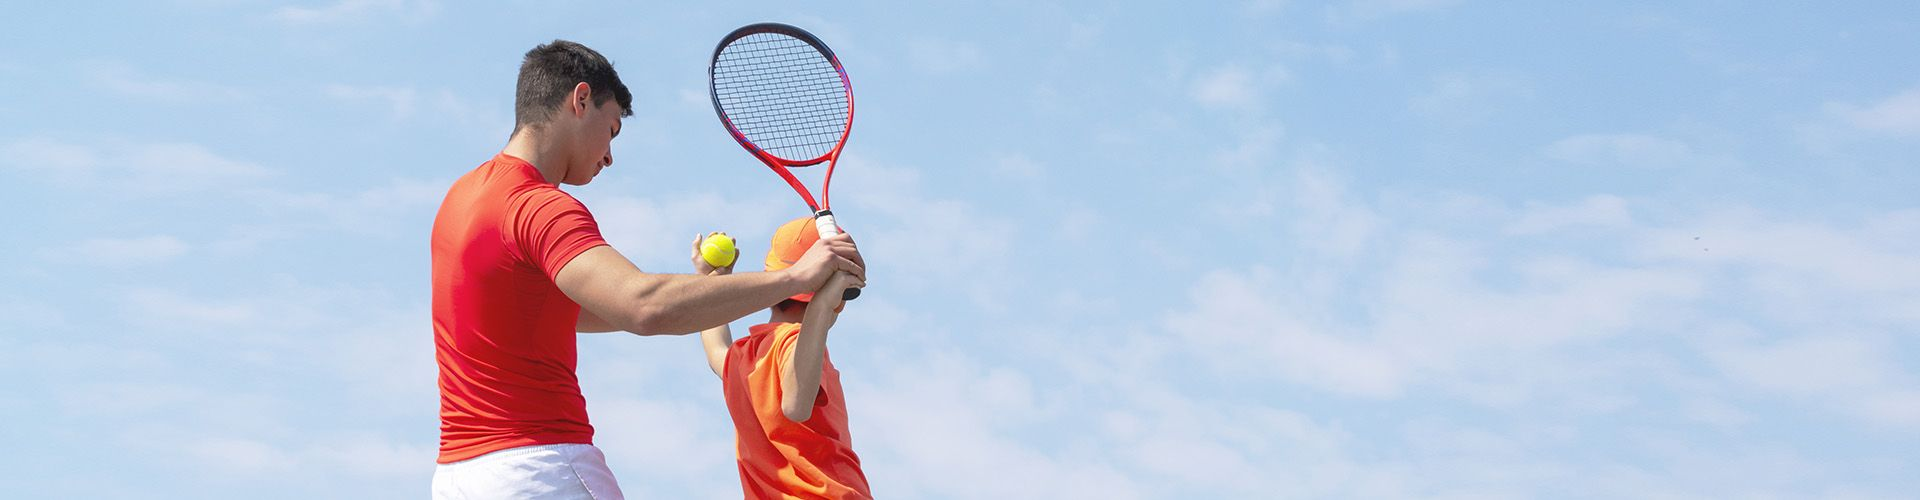 Tenis Verano 2021 Montemar